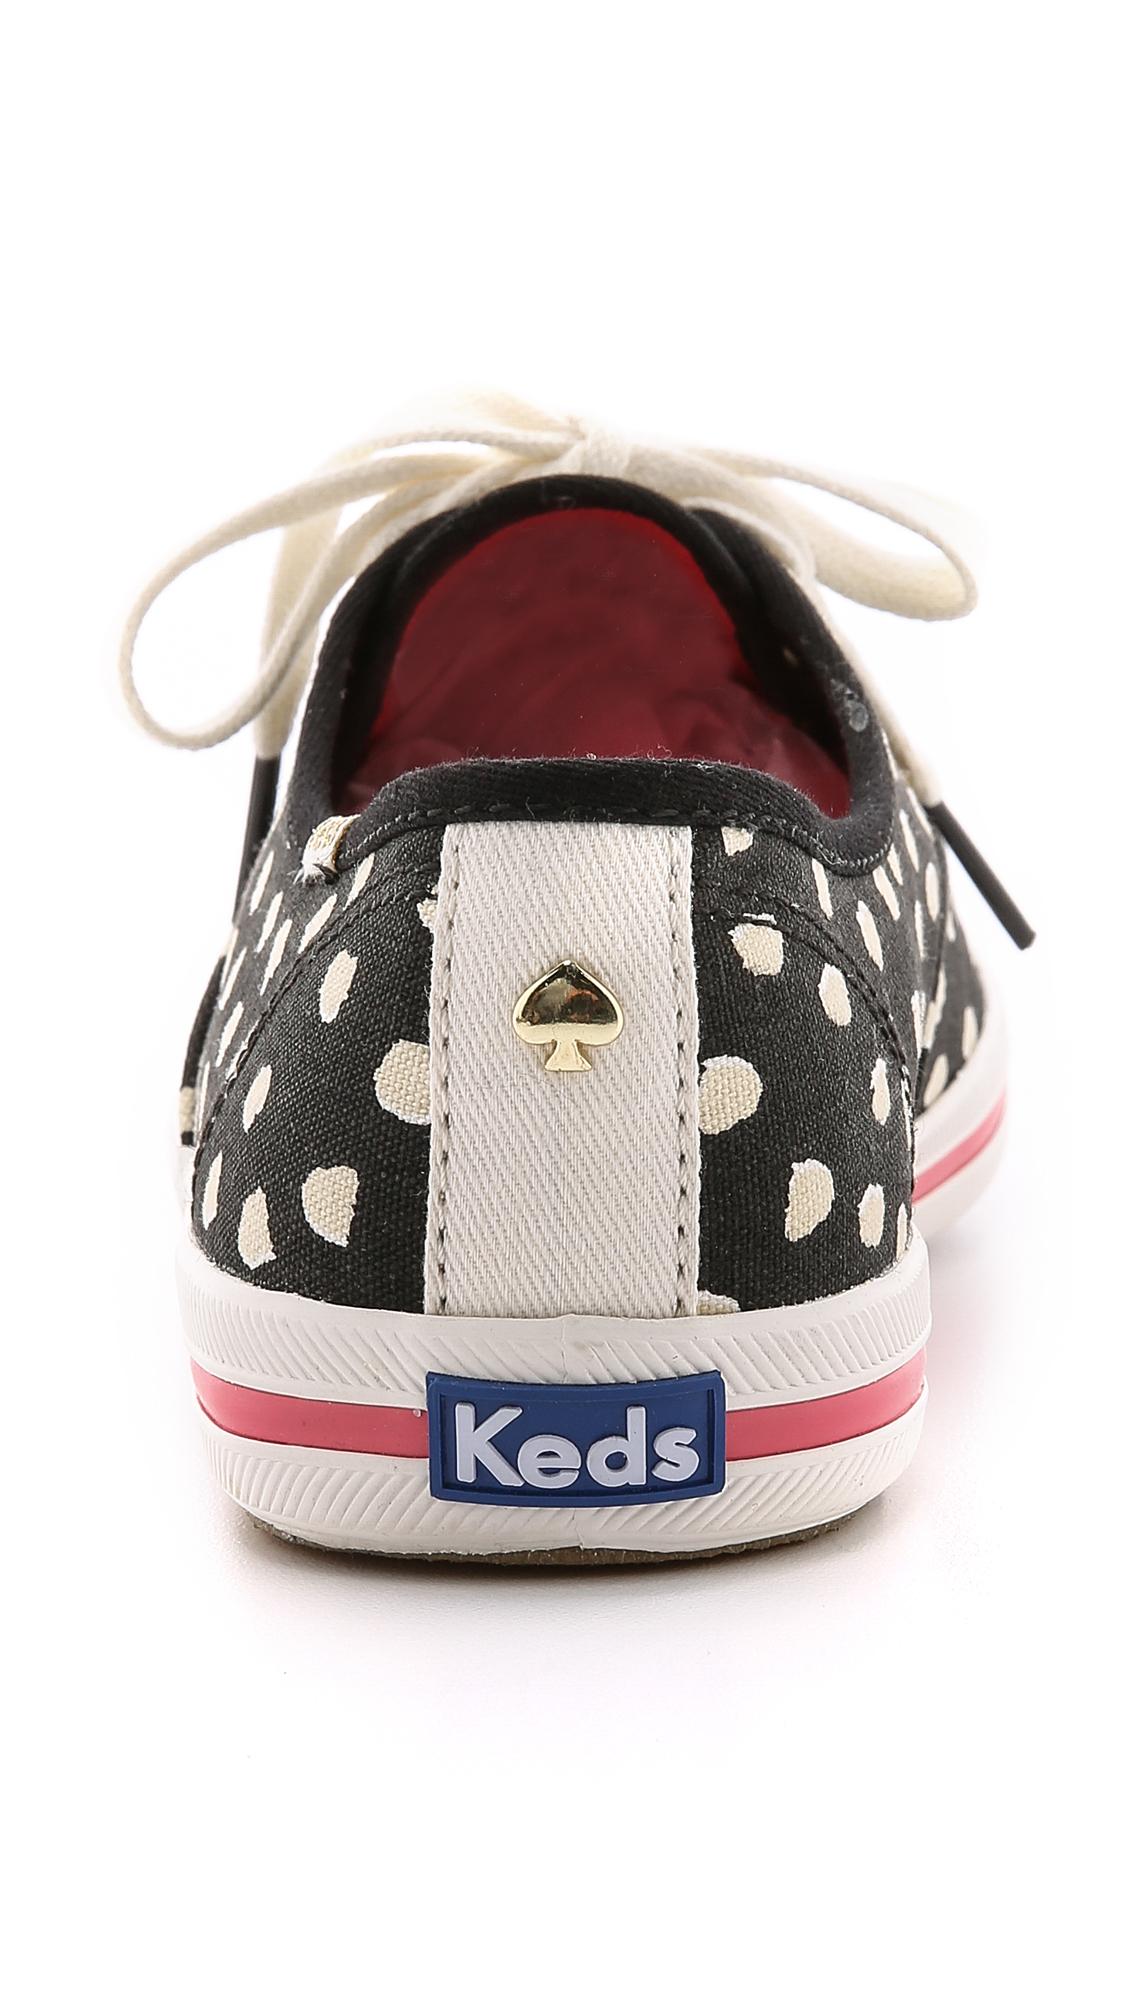 ab9c98bfed85 Lyst - Kate Spade Kick Flamingo Dot Keds Sneakers - Cream Flamingo ...